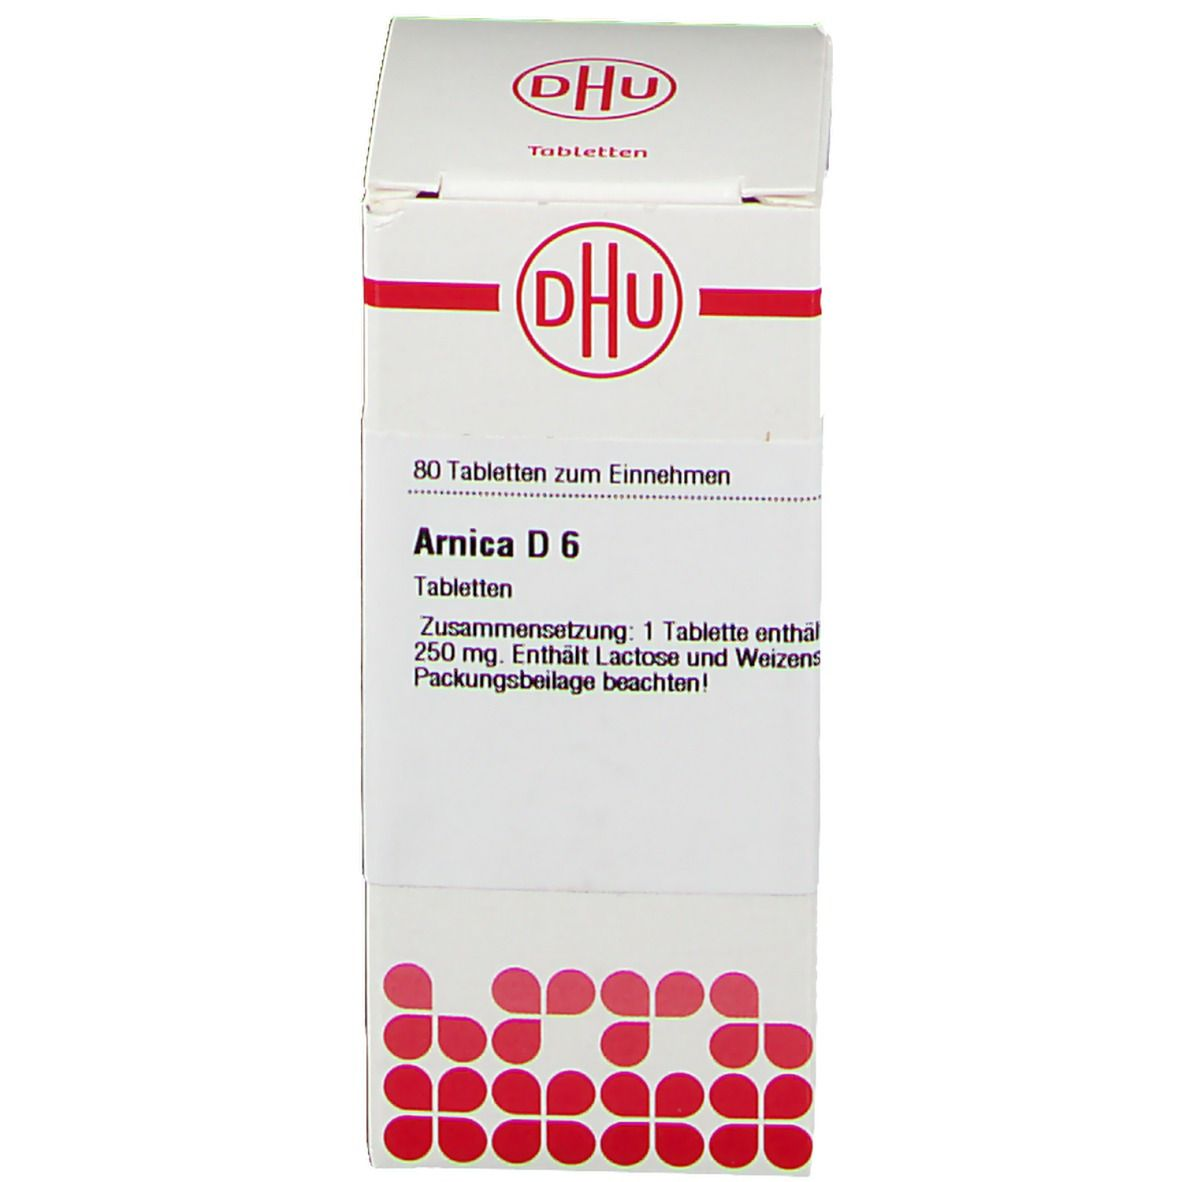 DHU Arnica D6